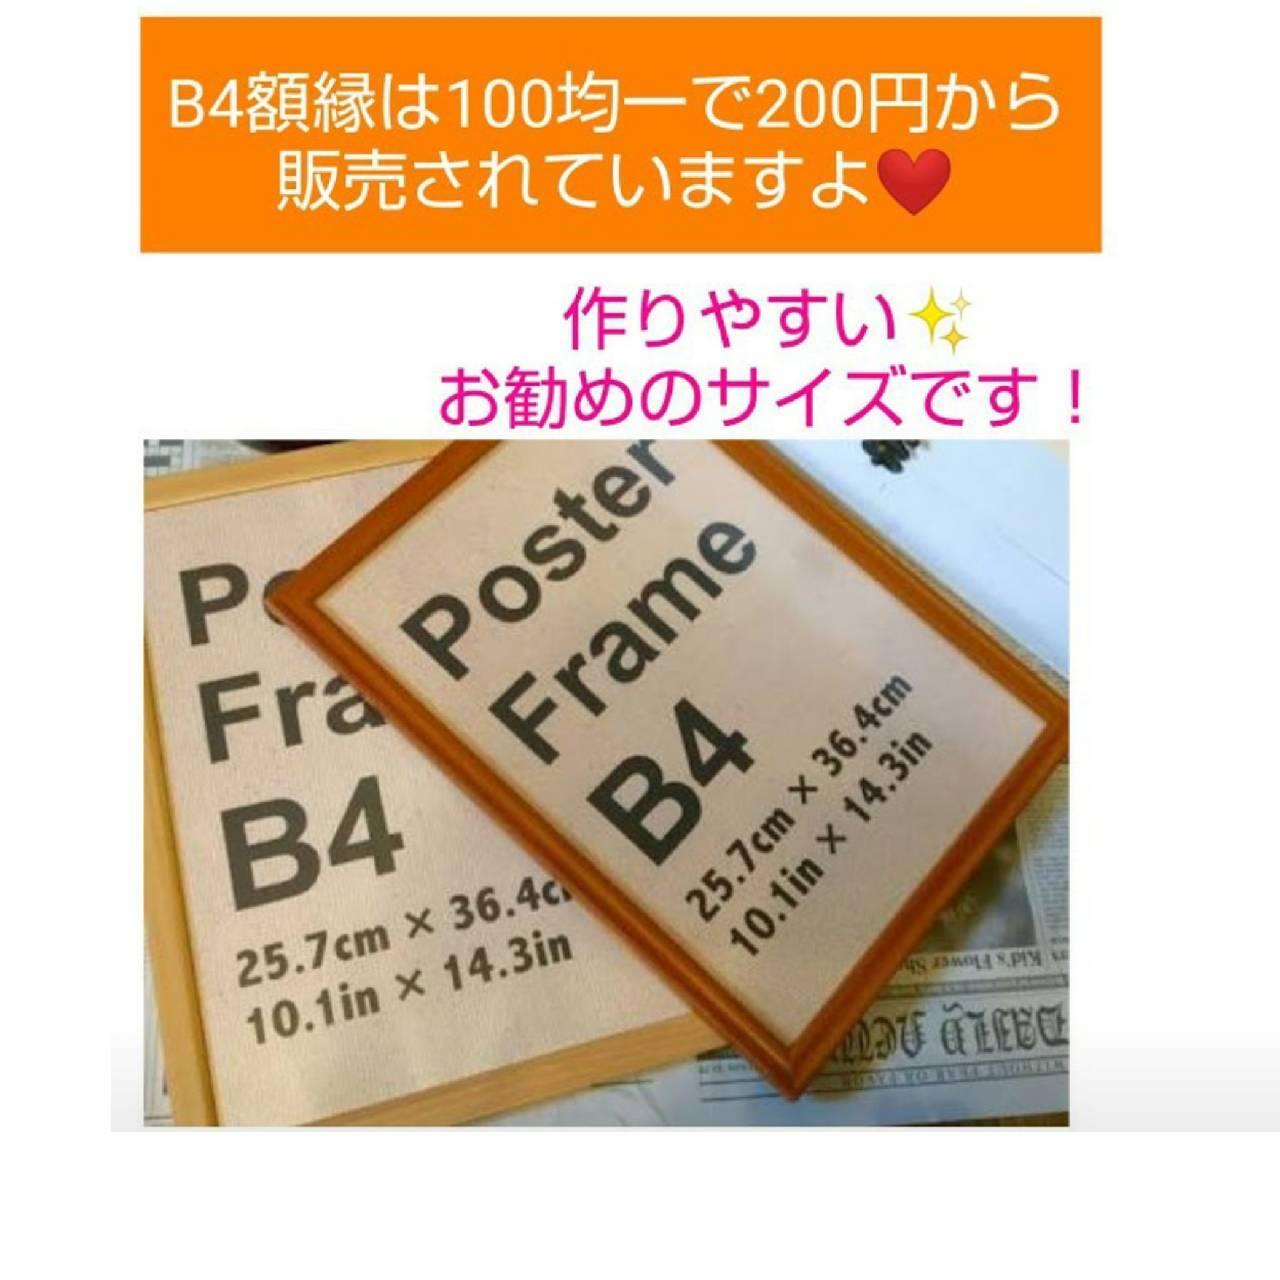 B4:四角【s11083】フルダイヤモンドアート✨